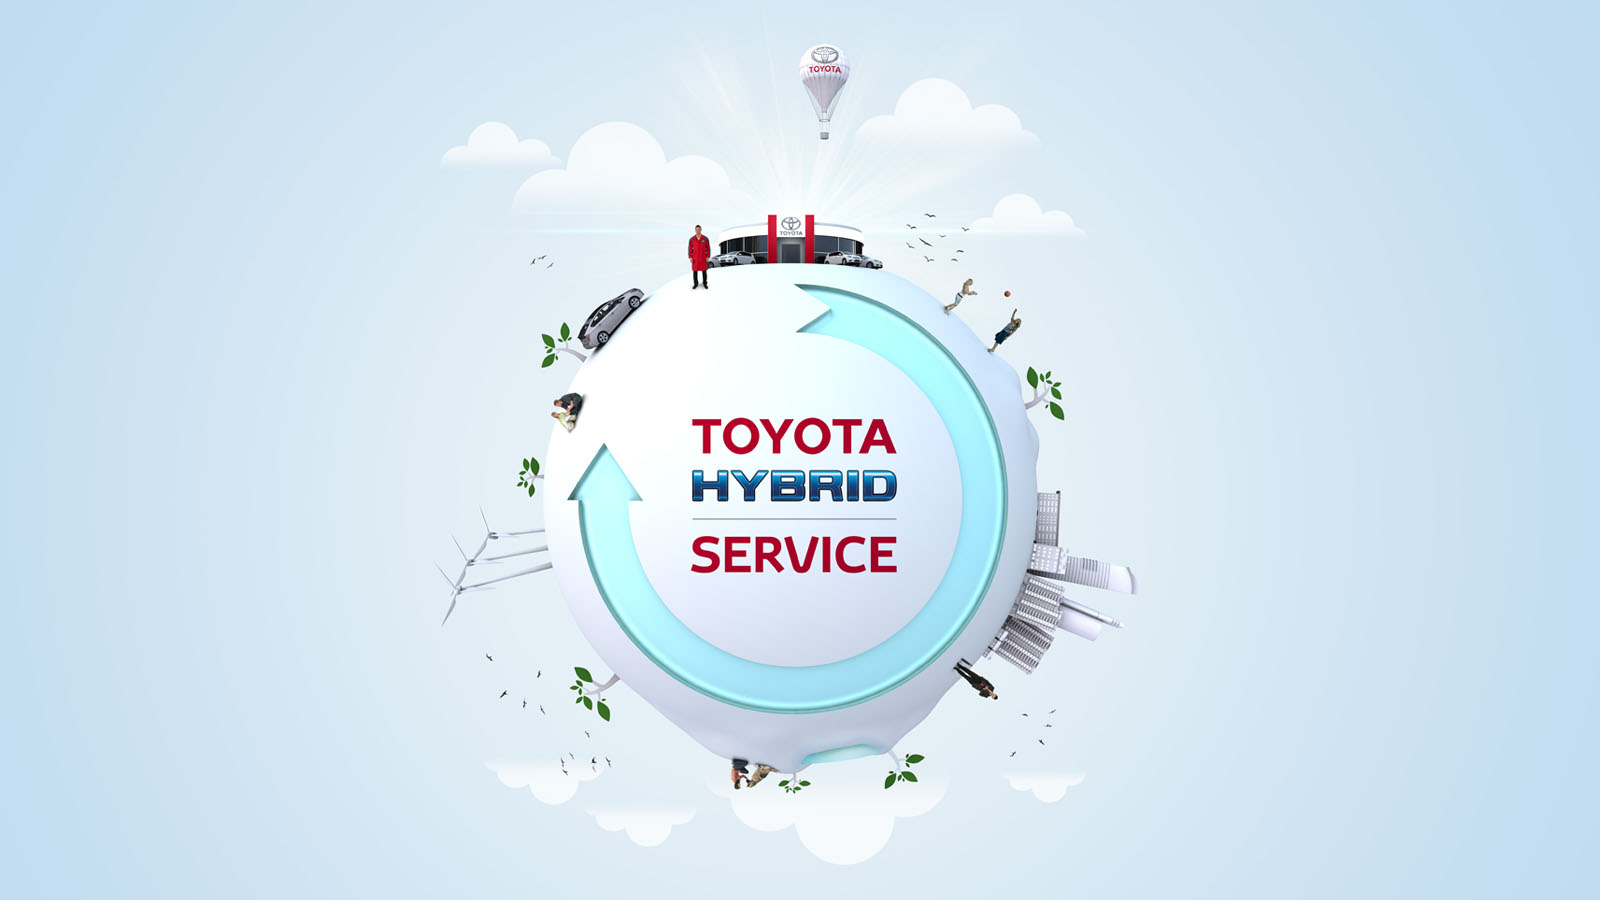 2014 Toyota Prius C >> Ta hand om din elhybrid med vår hybridservice -Toyota Sverige